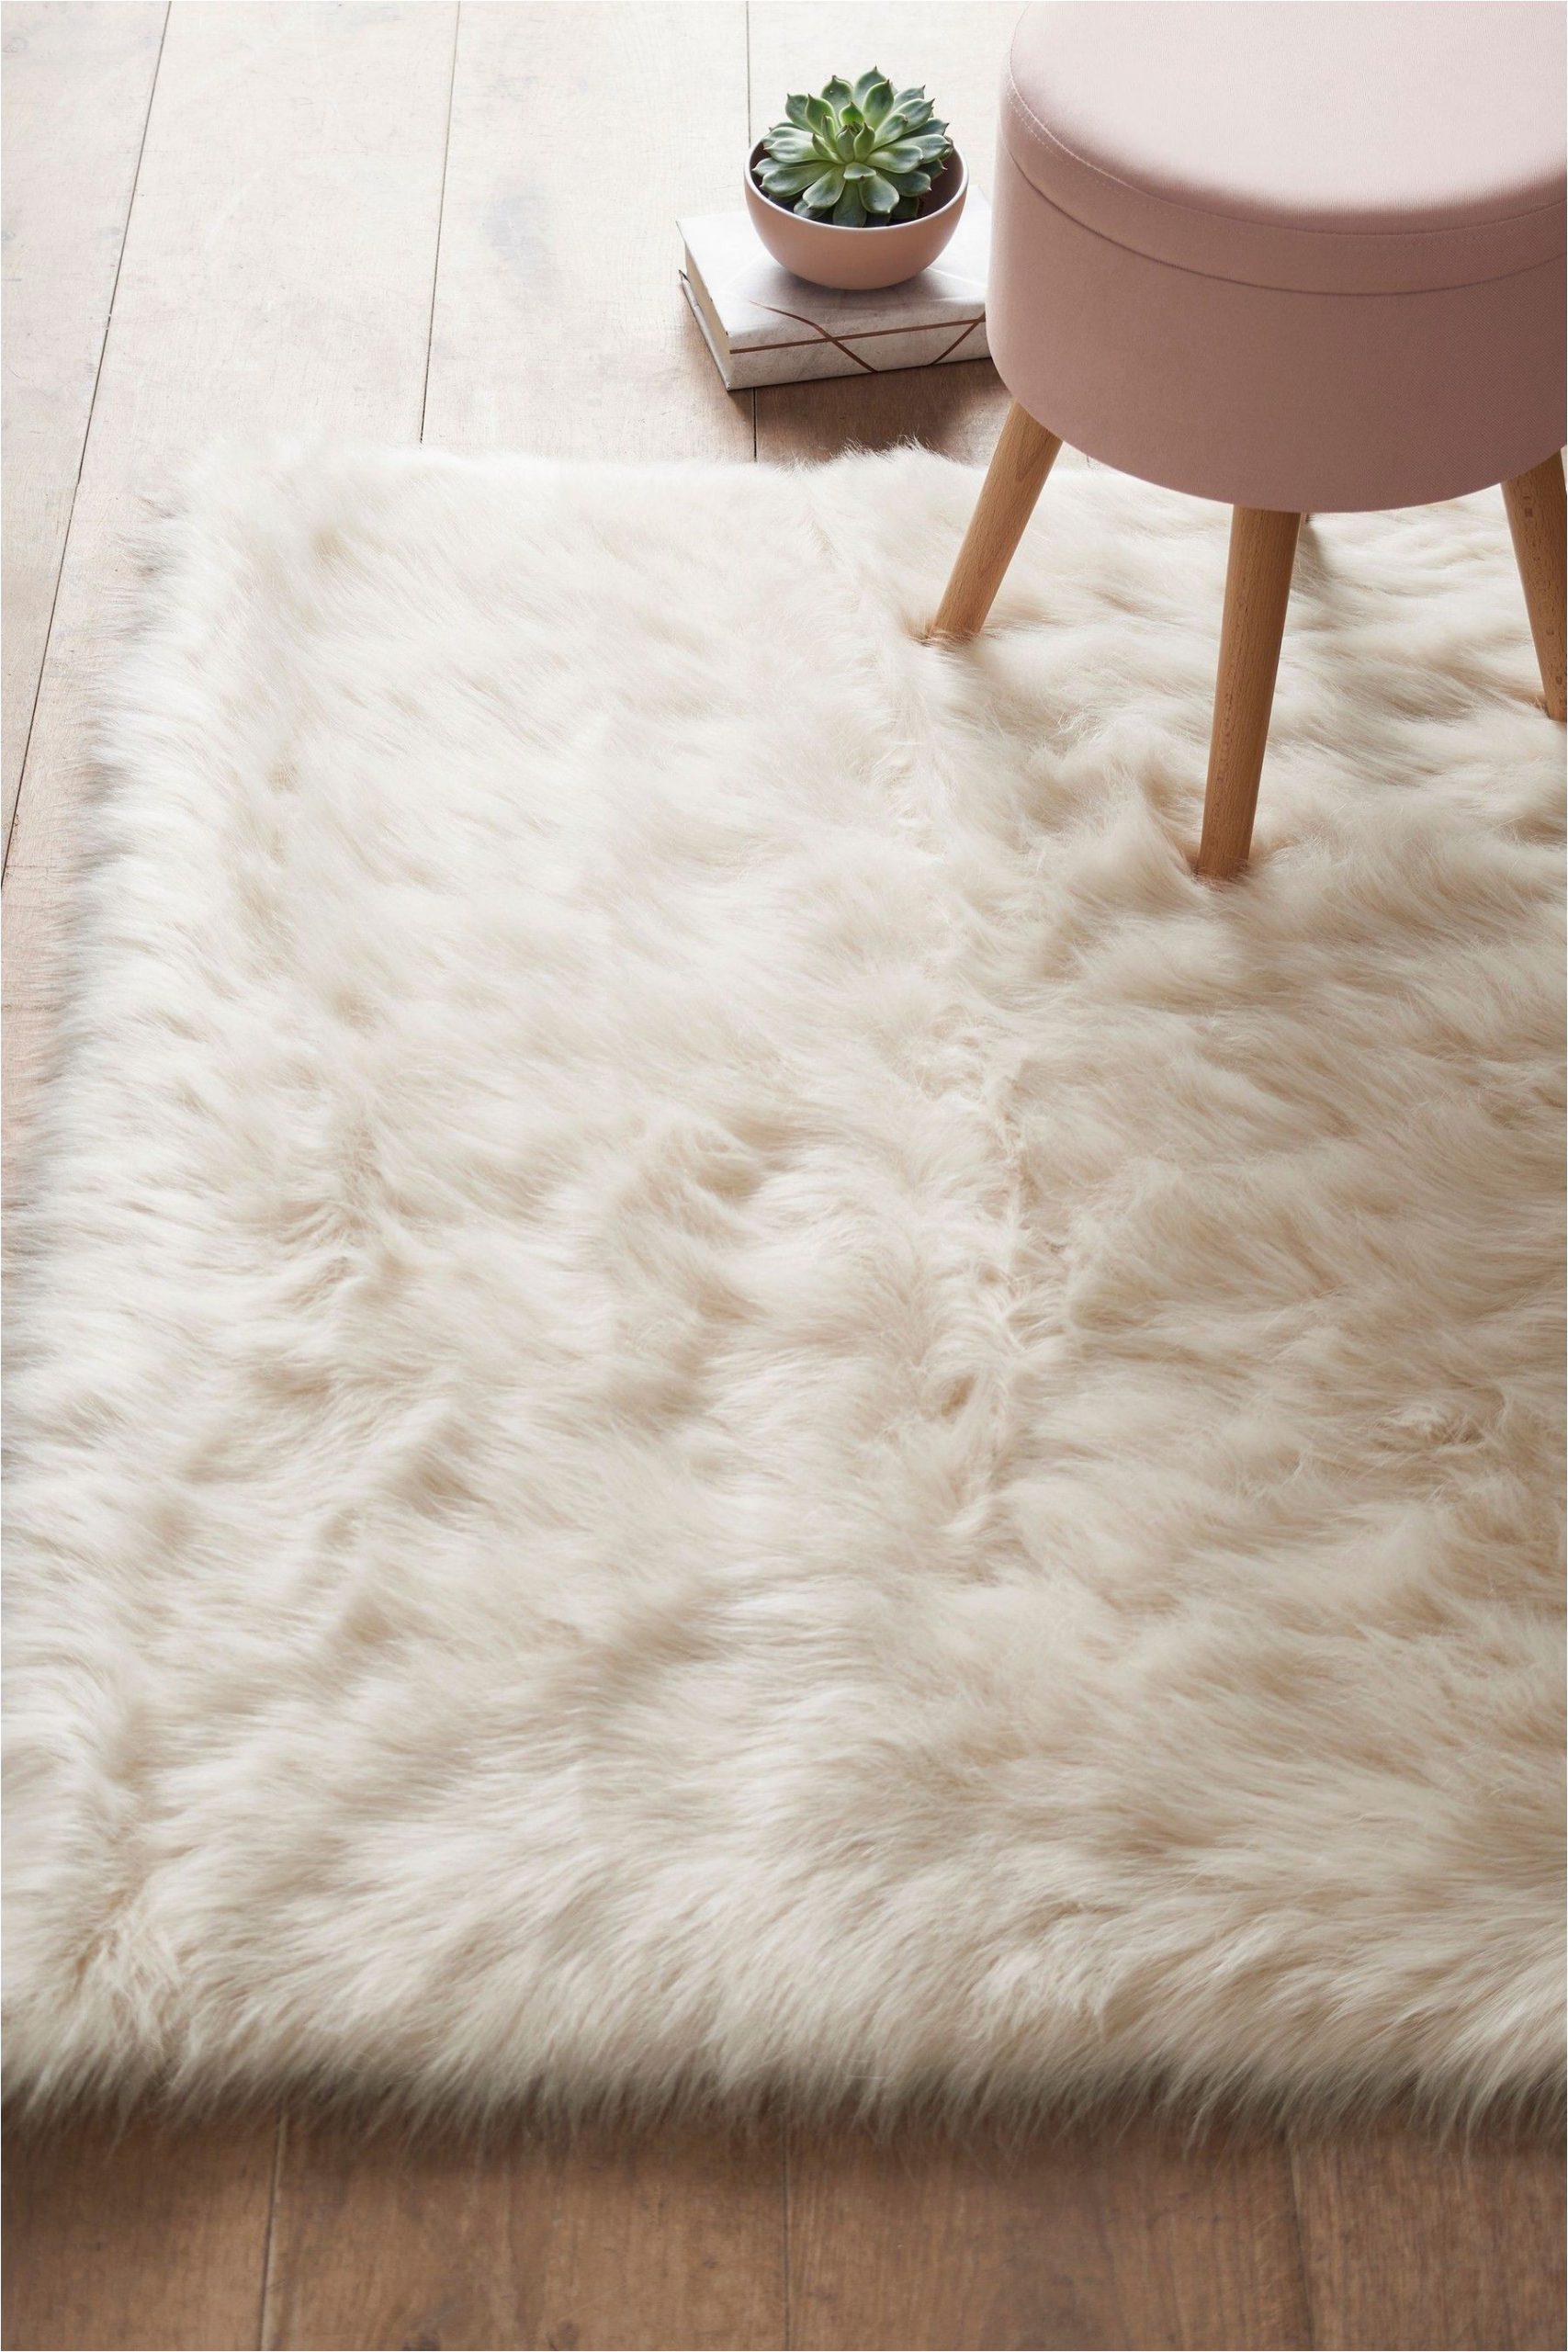 Piper Faux Fur area Rug Next Faux Sheepskin Rug Cream Luxurybedroomrugs